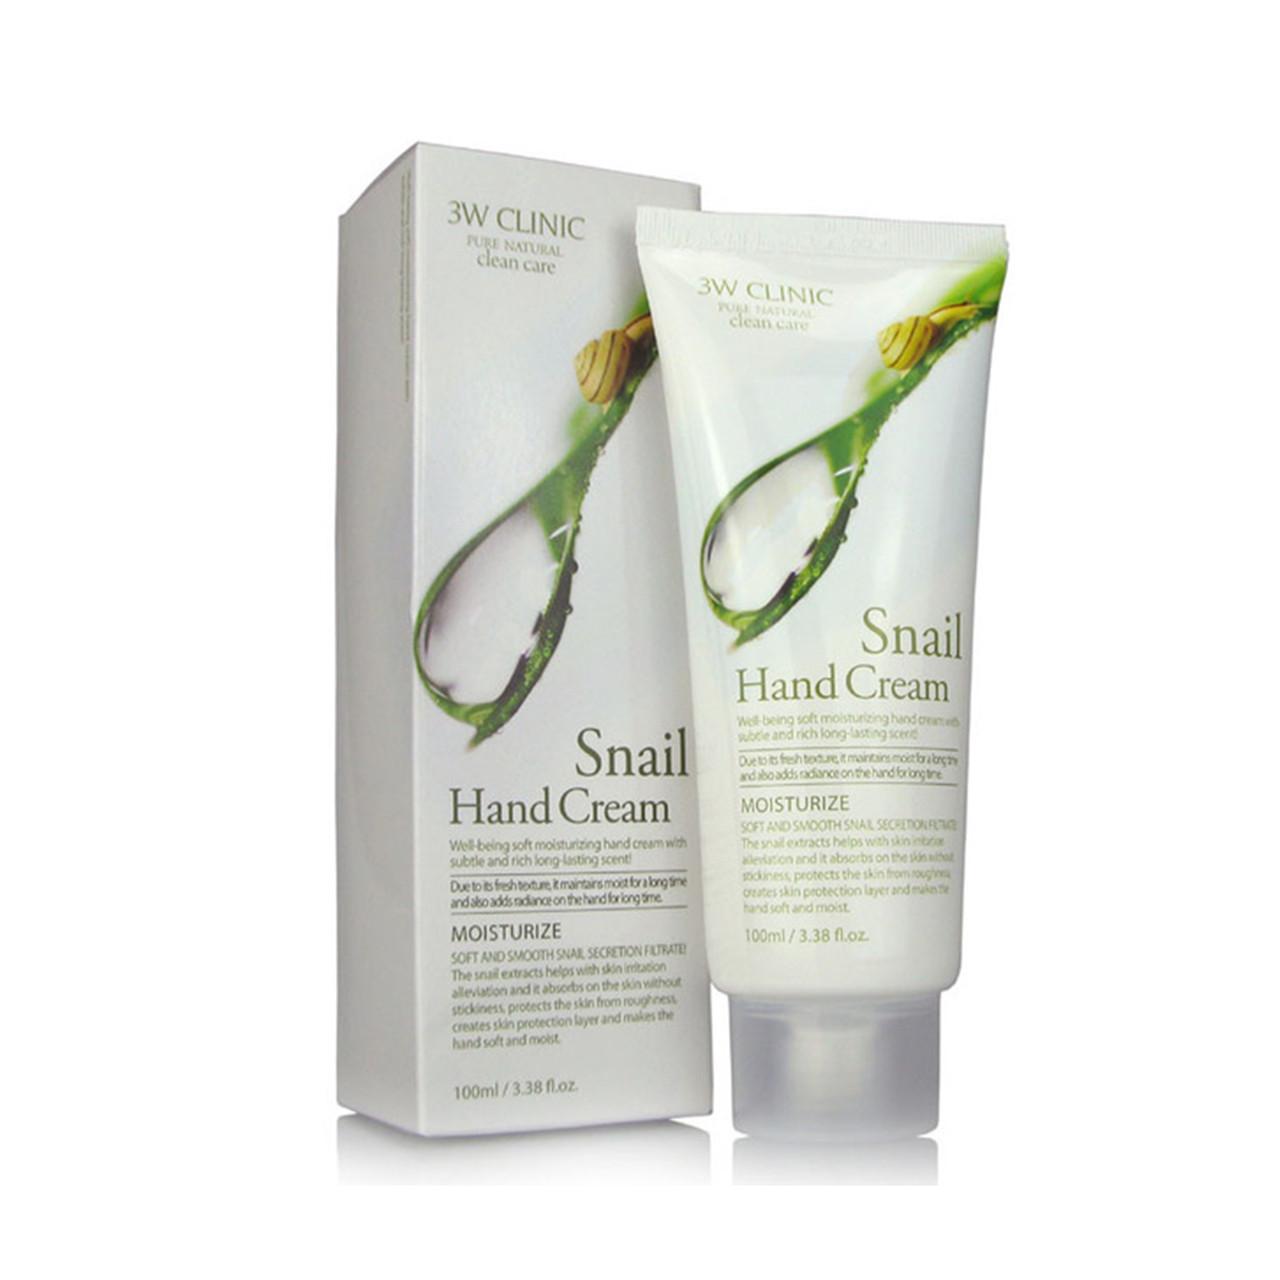 3W CLINIC Крем для рук увлажняющий УЛИТОЧНЫЙ МУЦИН Snail Hand Cream, 100 мл